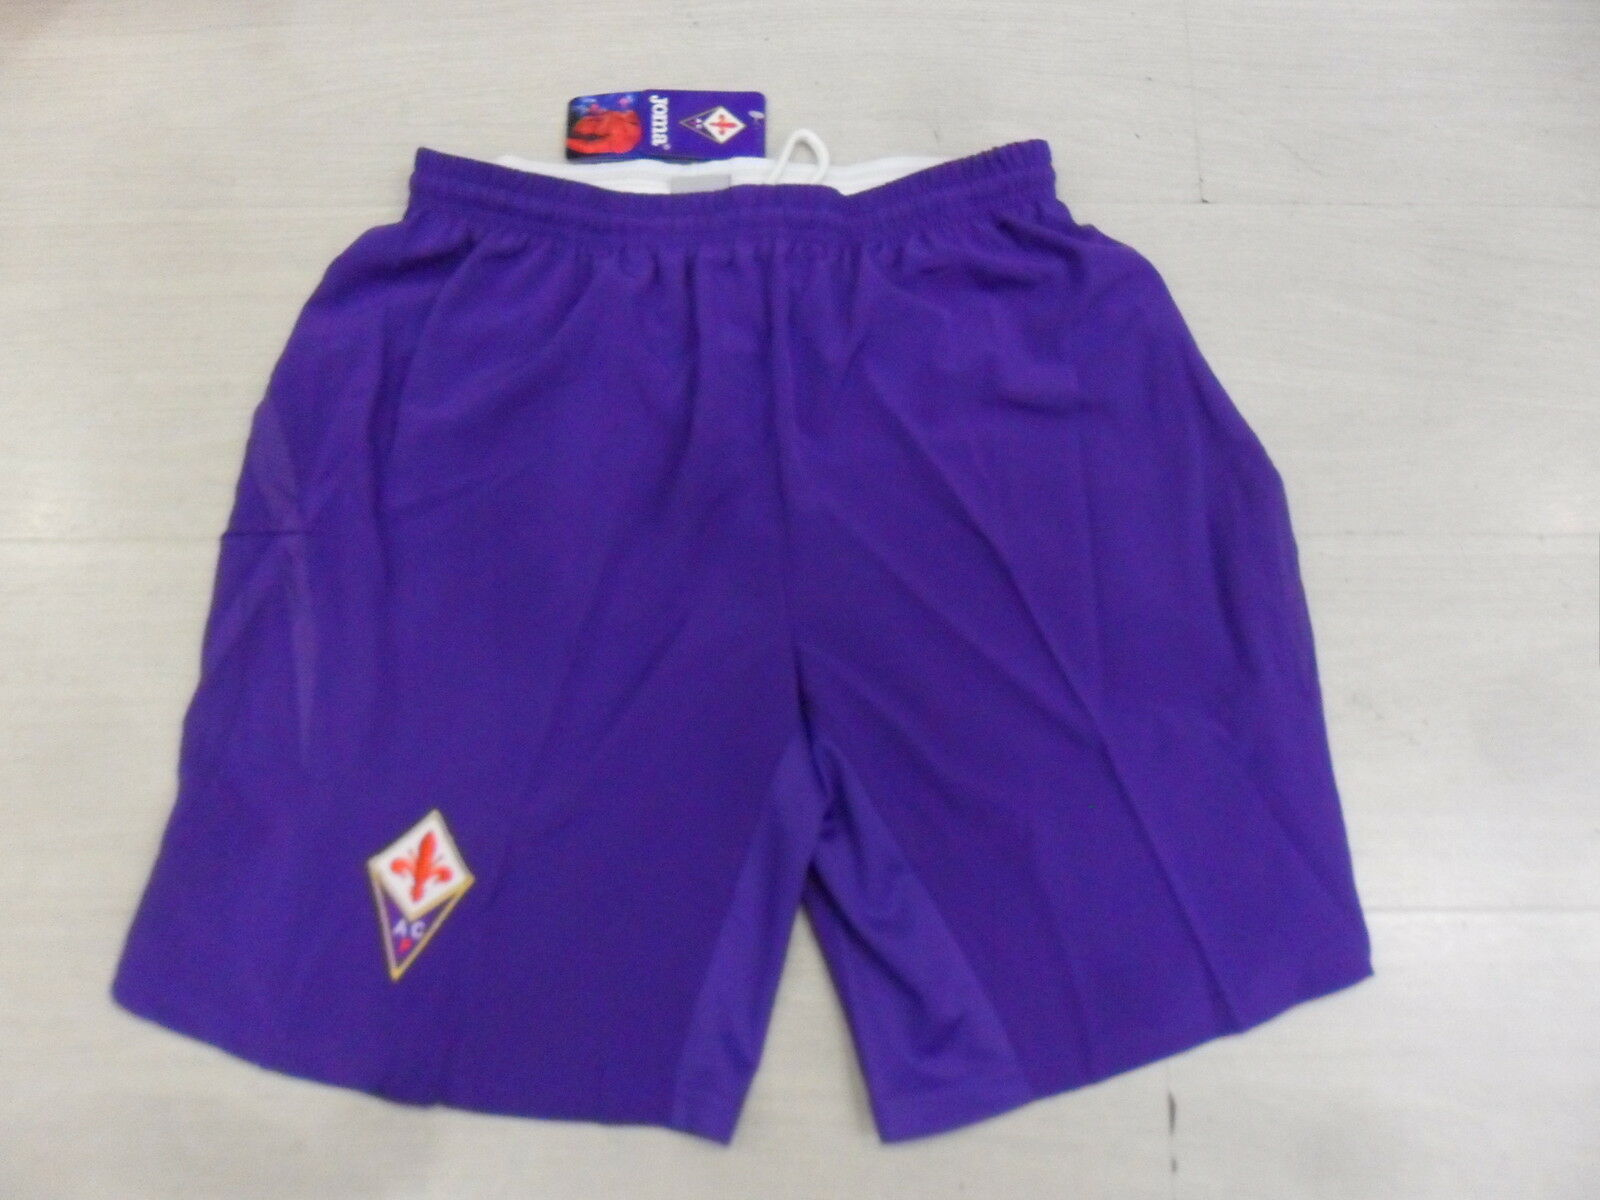 1653 size XL JOMA FIORENTINA SHORT COURSE TROIS MATCH short short purple